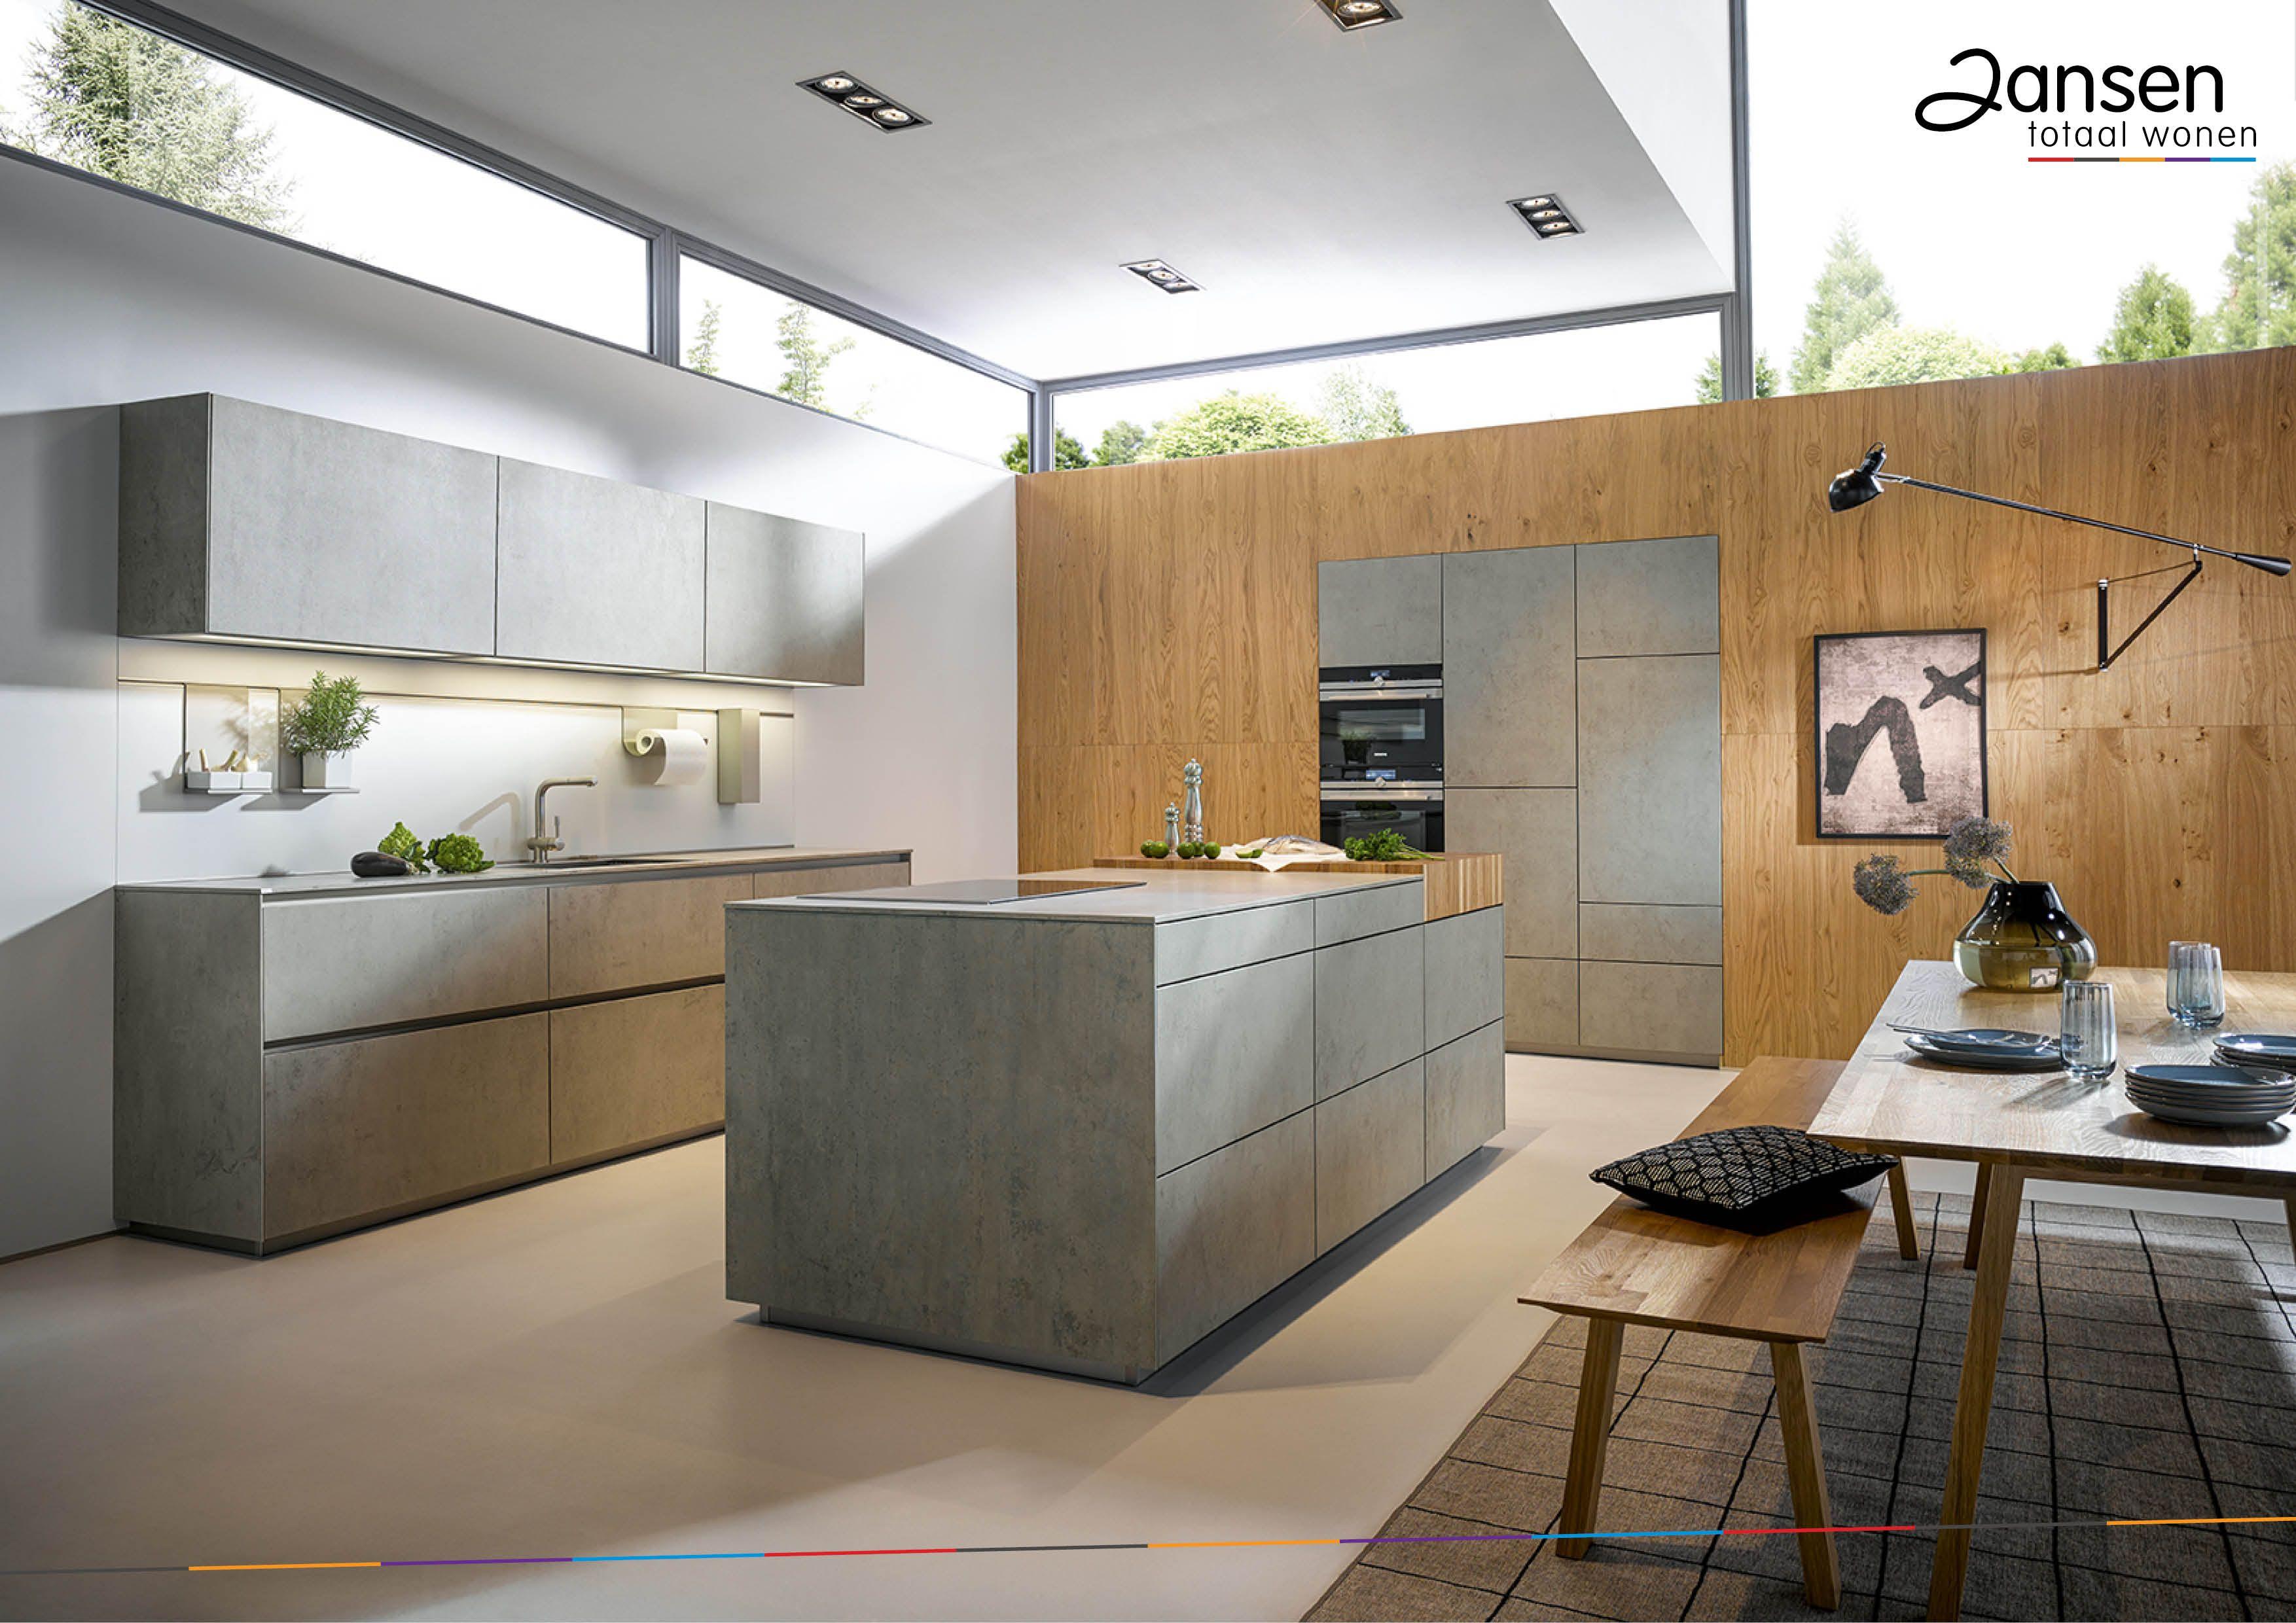 NX950 Keuken | Next125 | Bij Jansen | Keukens bij Jansen | Pinterest